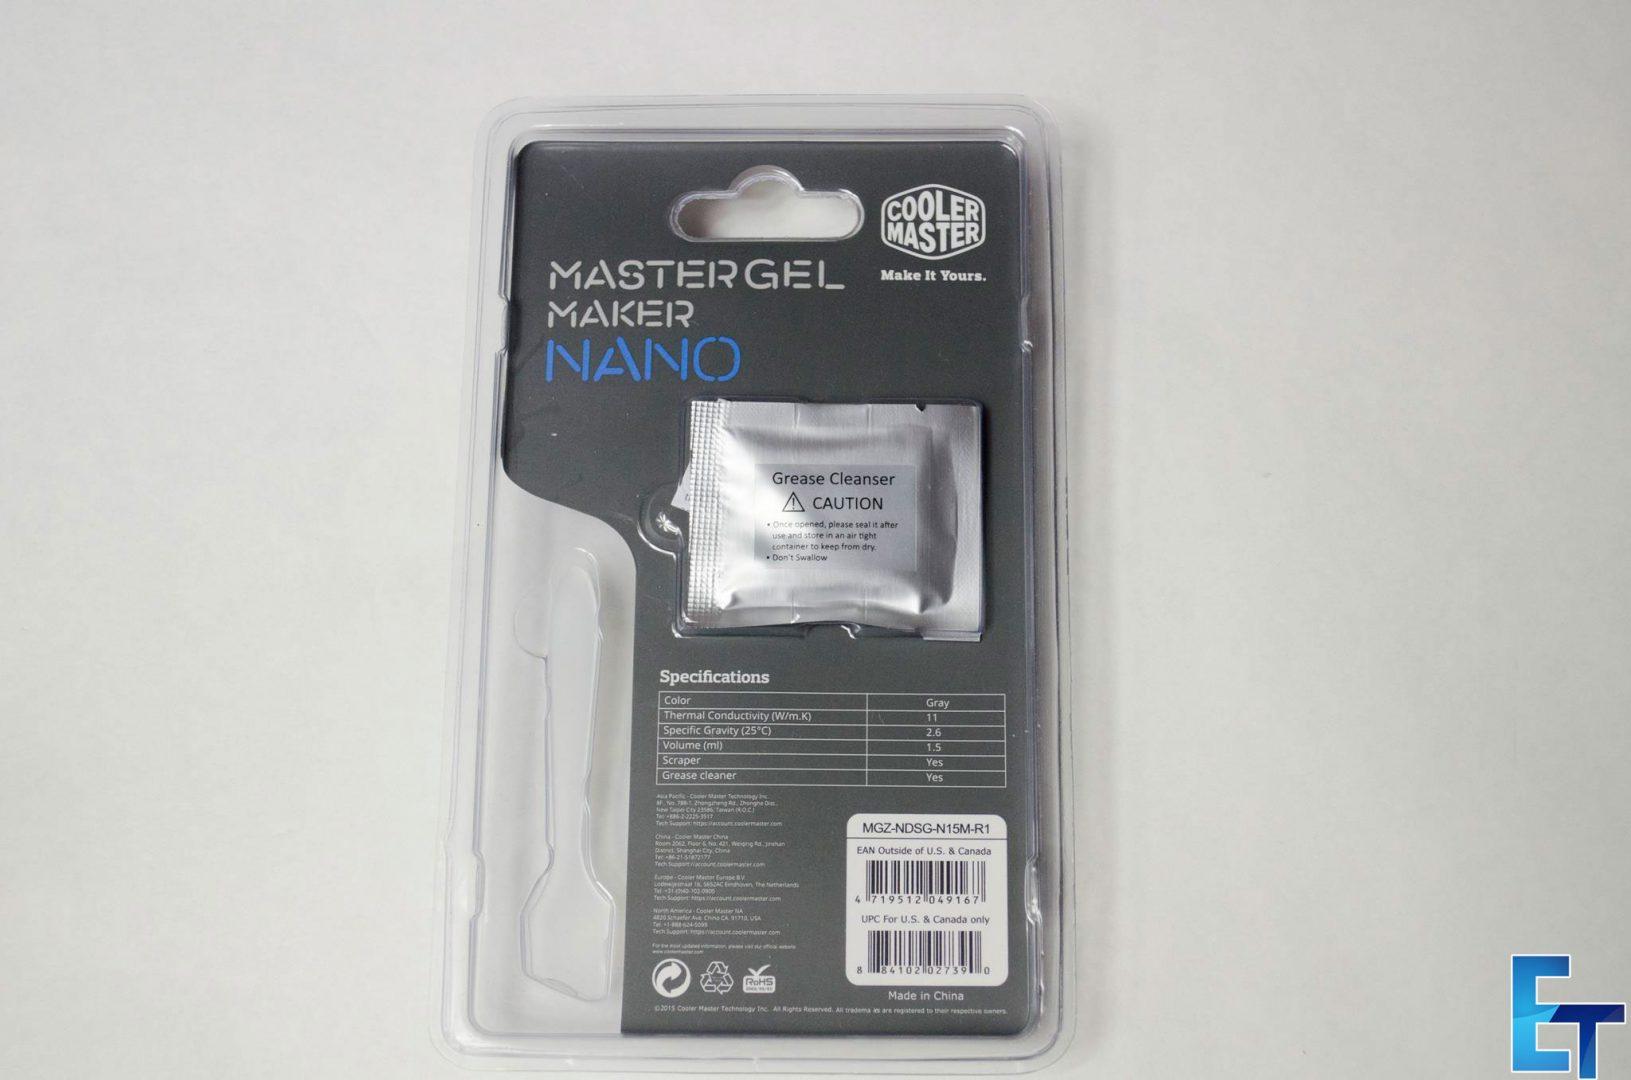 Cooler-Master-MasterGel-Maker-Nano-review_1